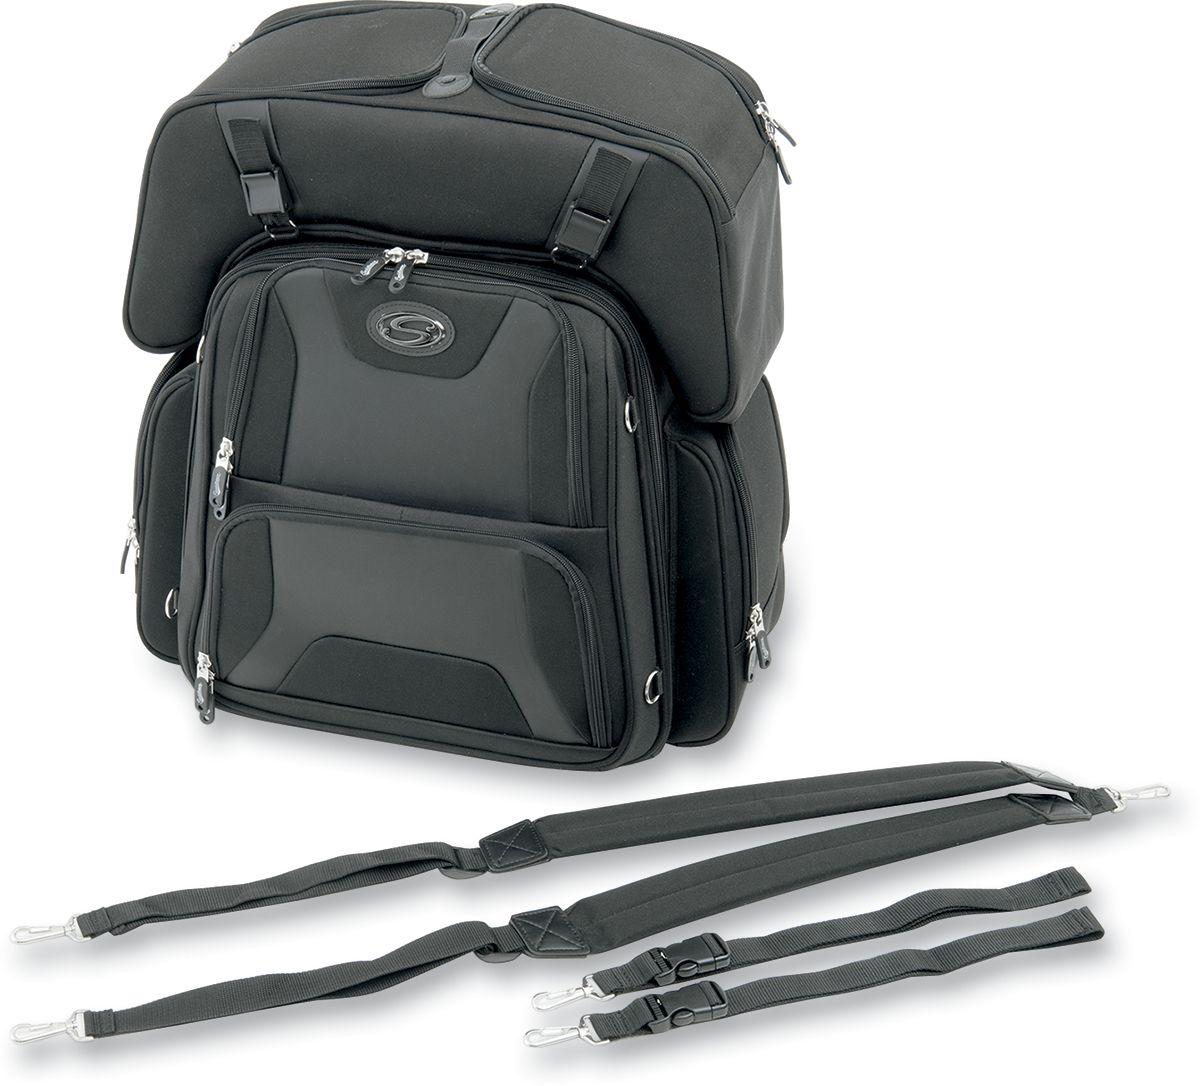 SISSY BAR BAG FTB3600